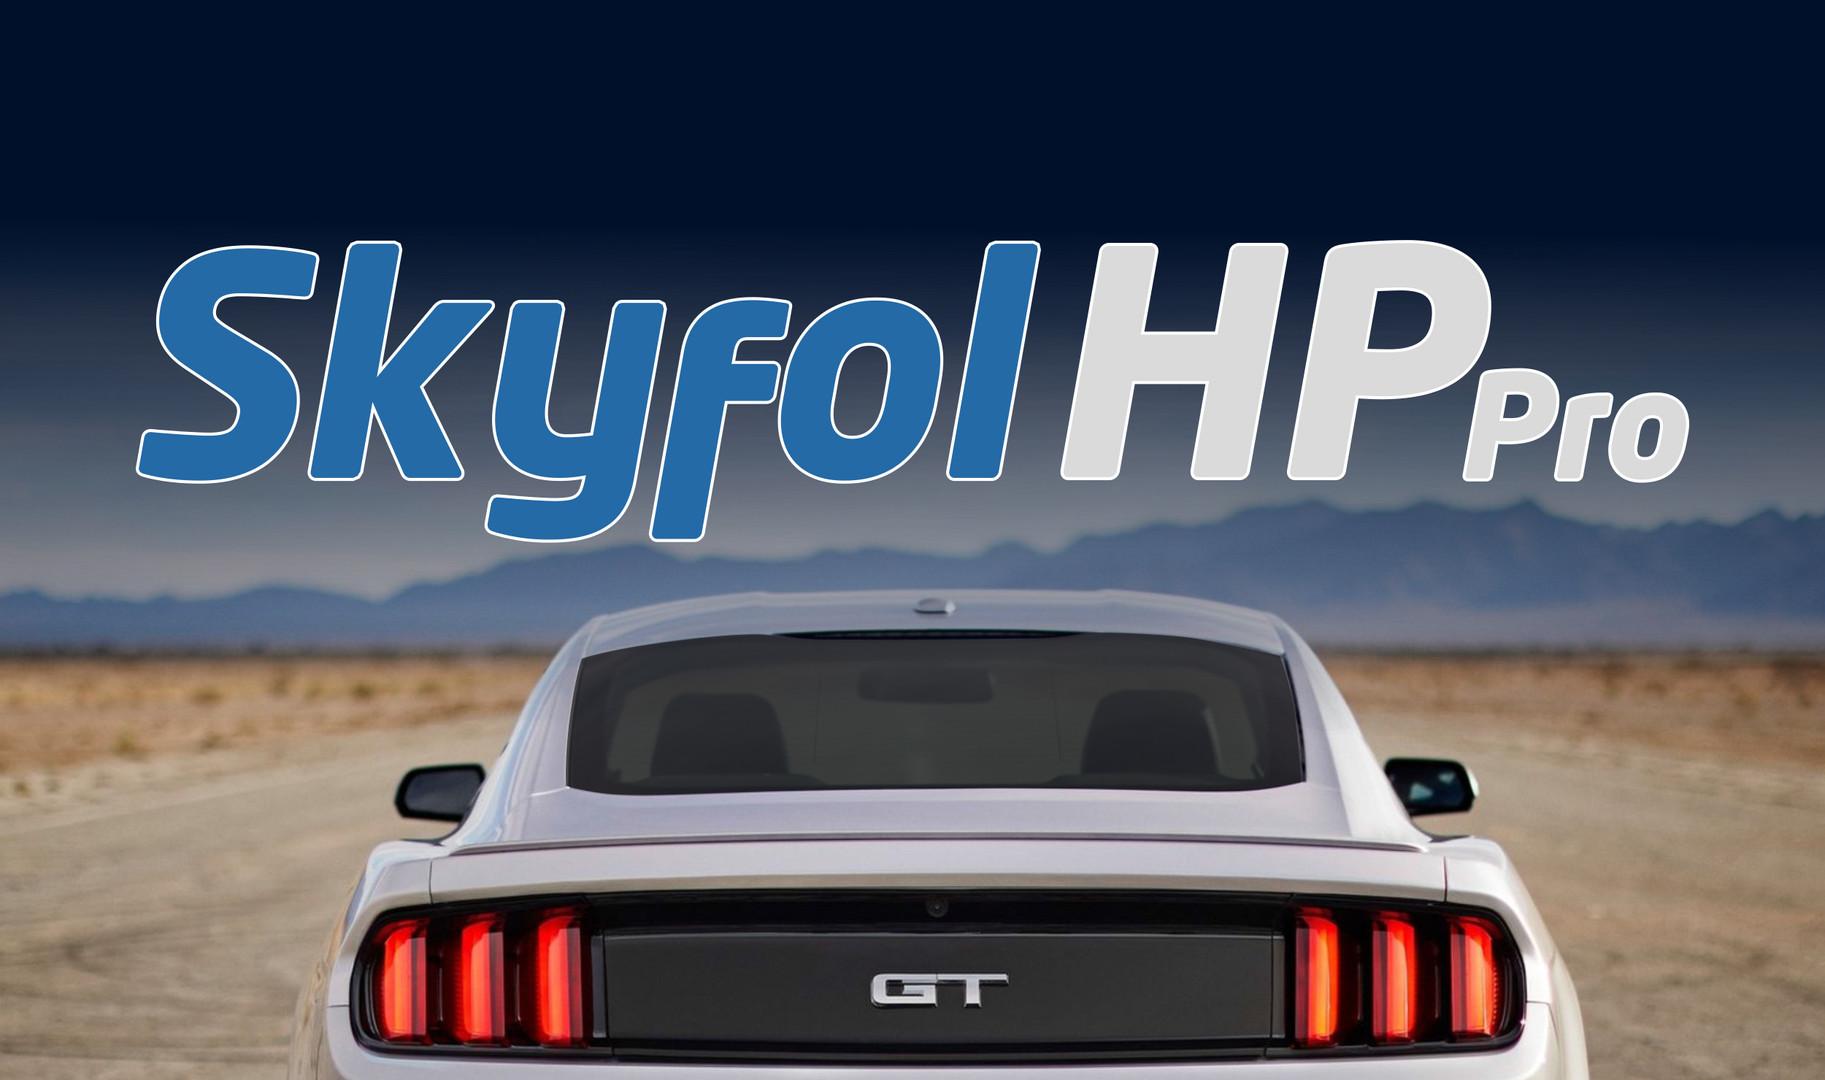 Skyfol HP Pro